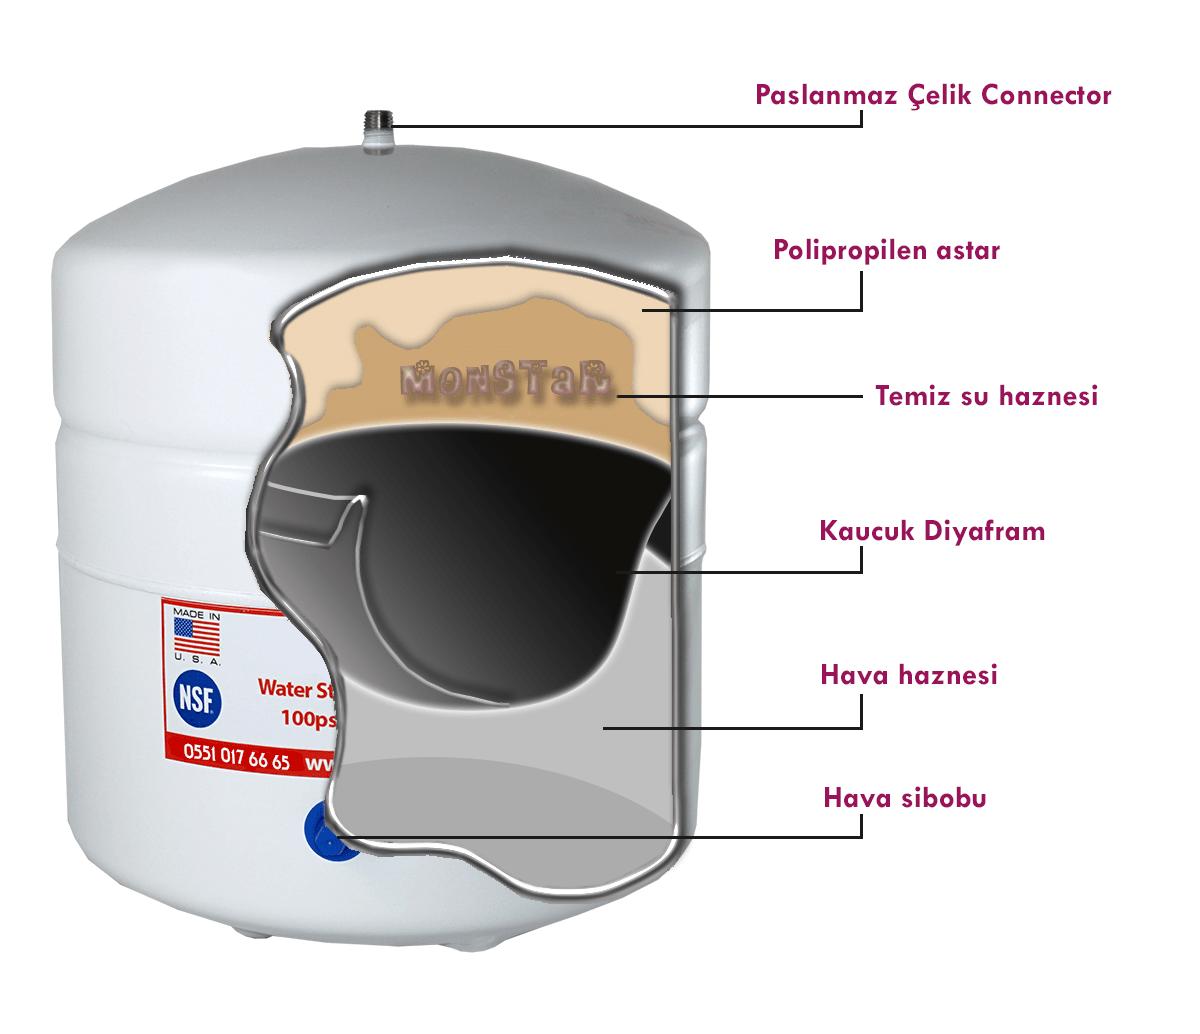 8 litre su arıtma depo